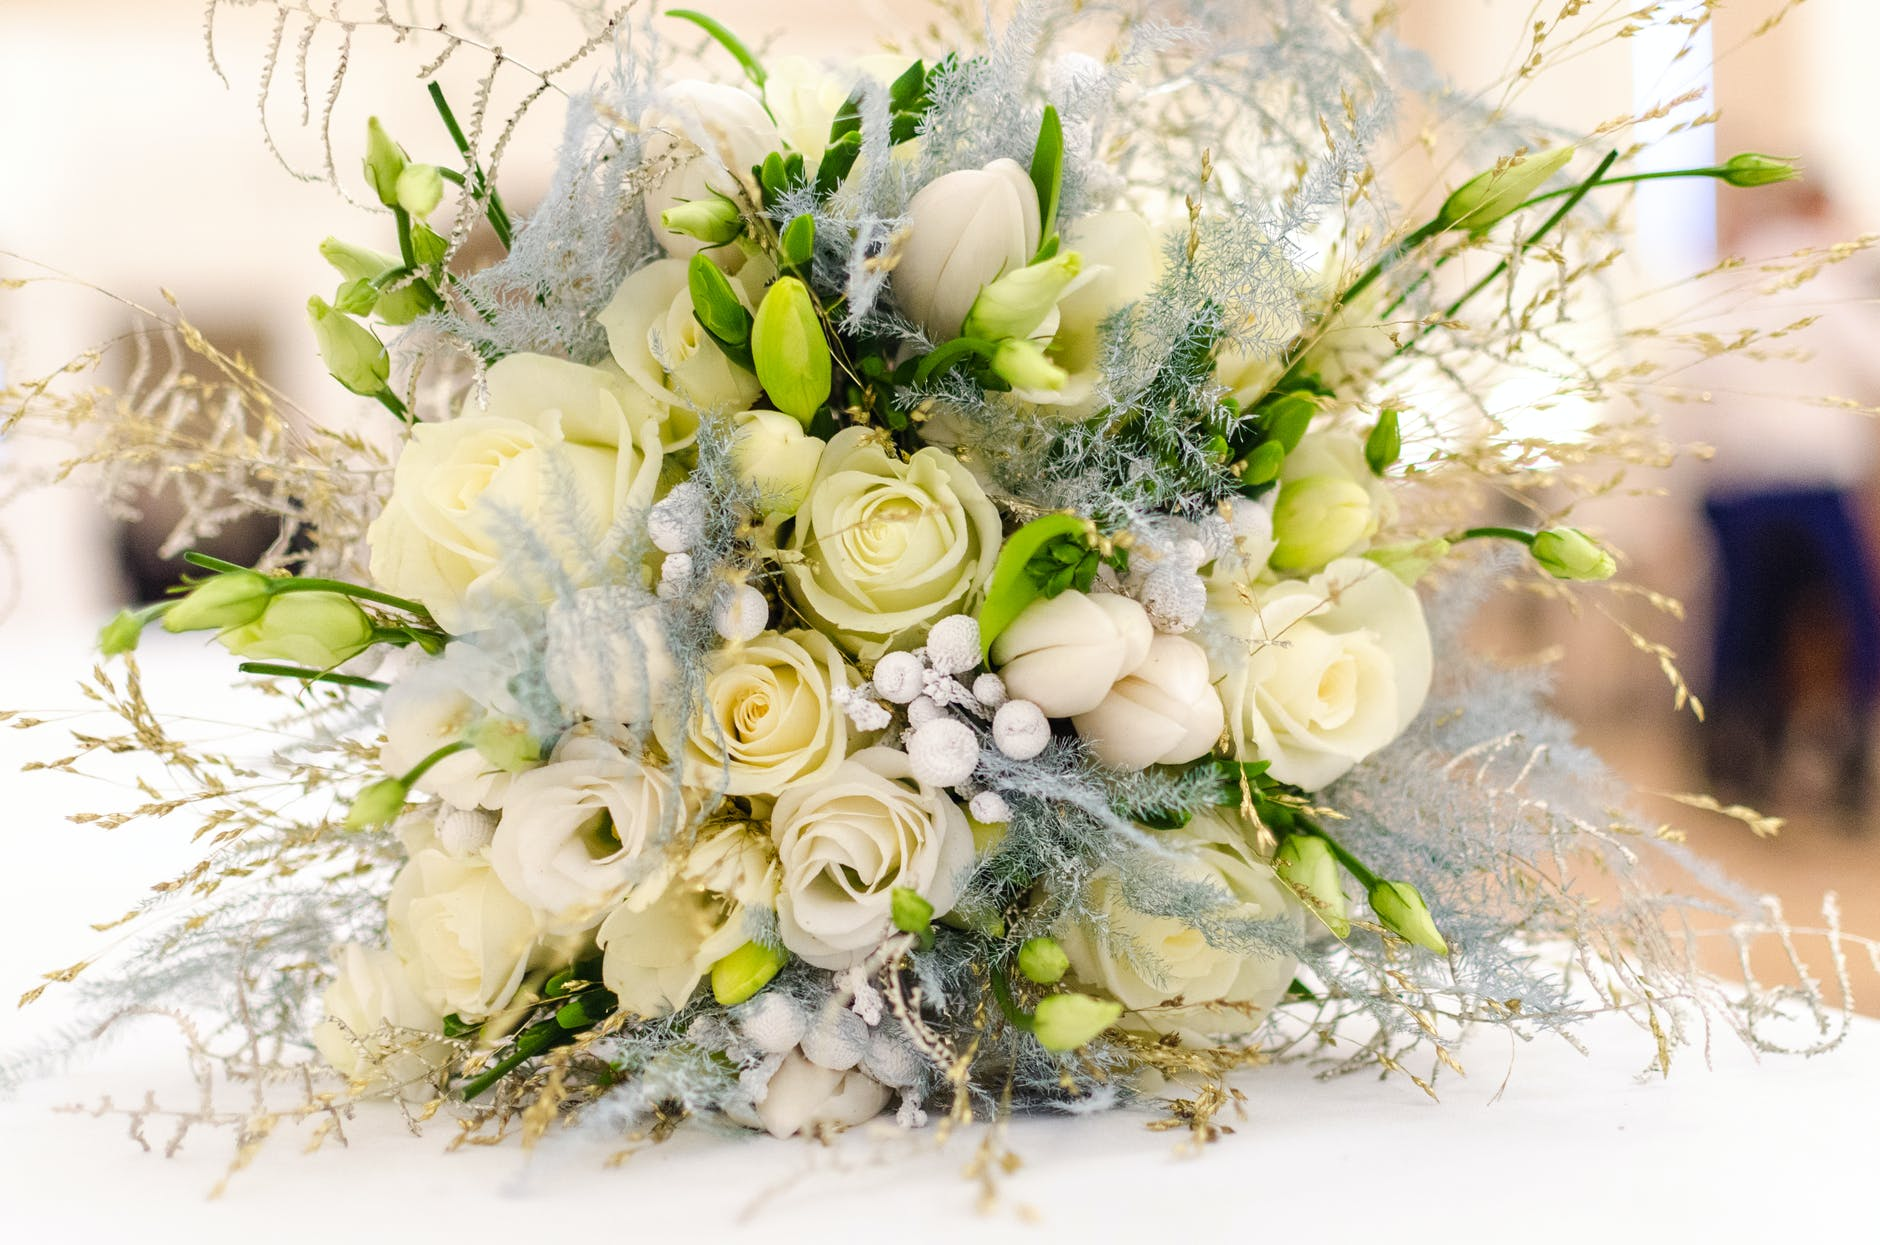 gambar bunga mawar hitam putih keren